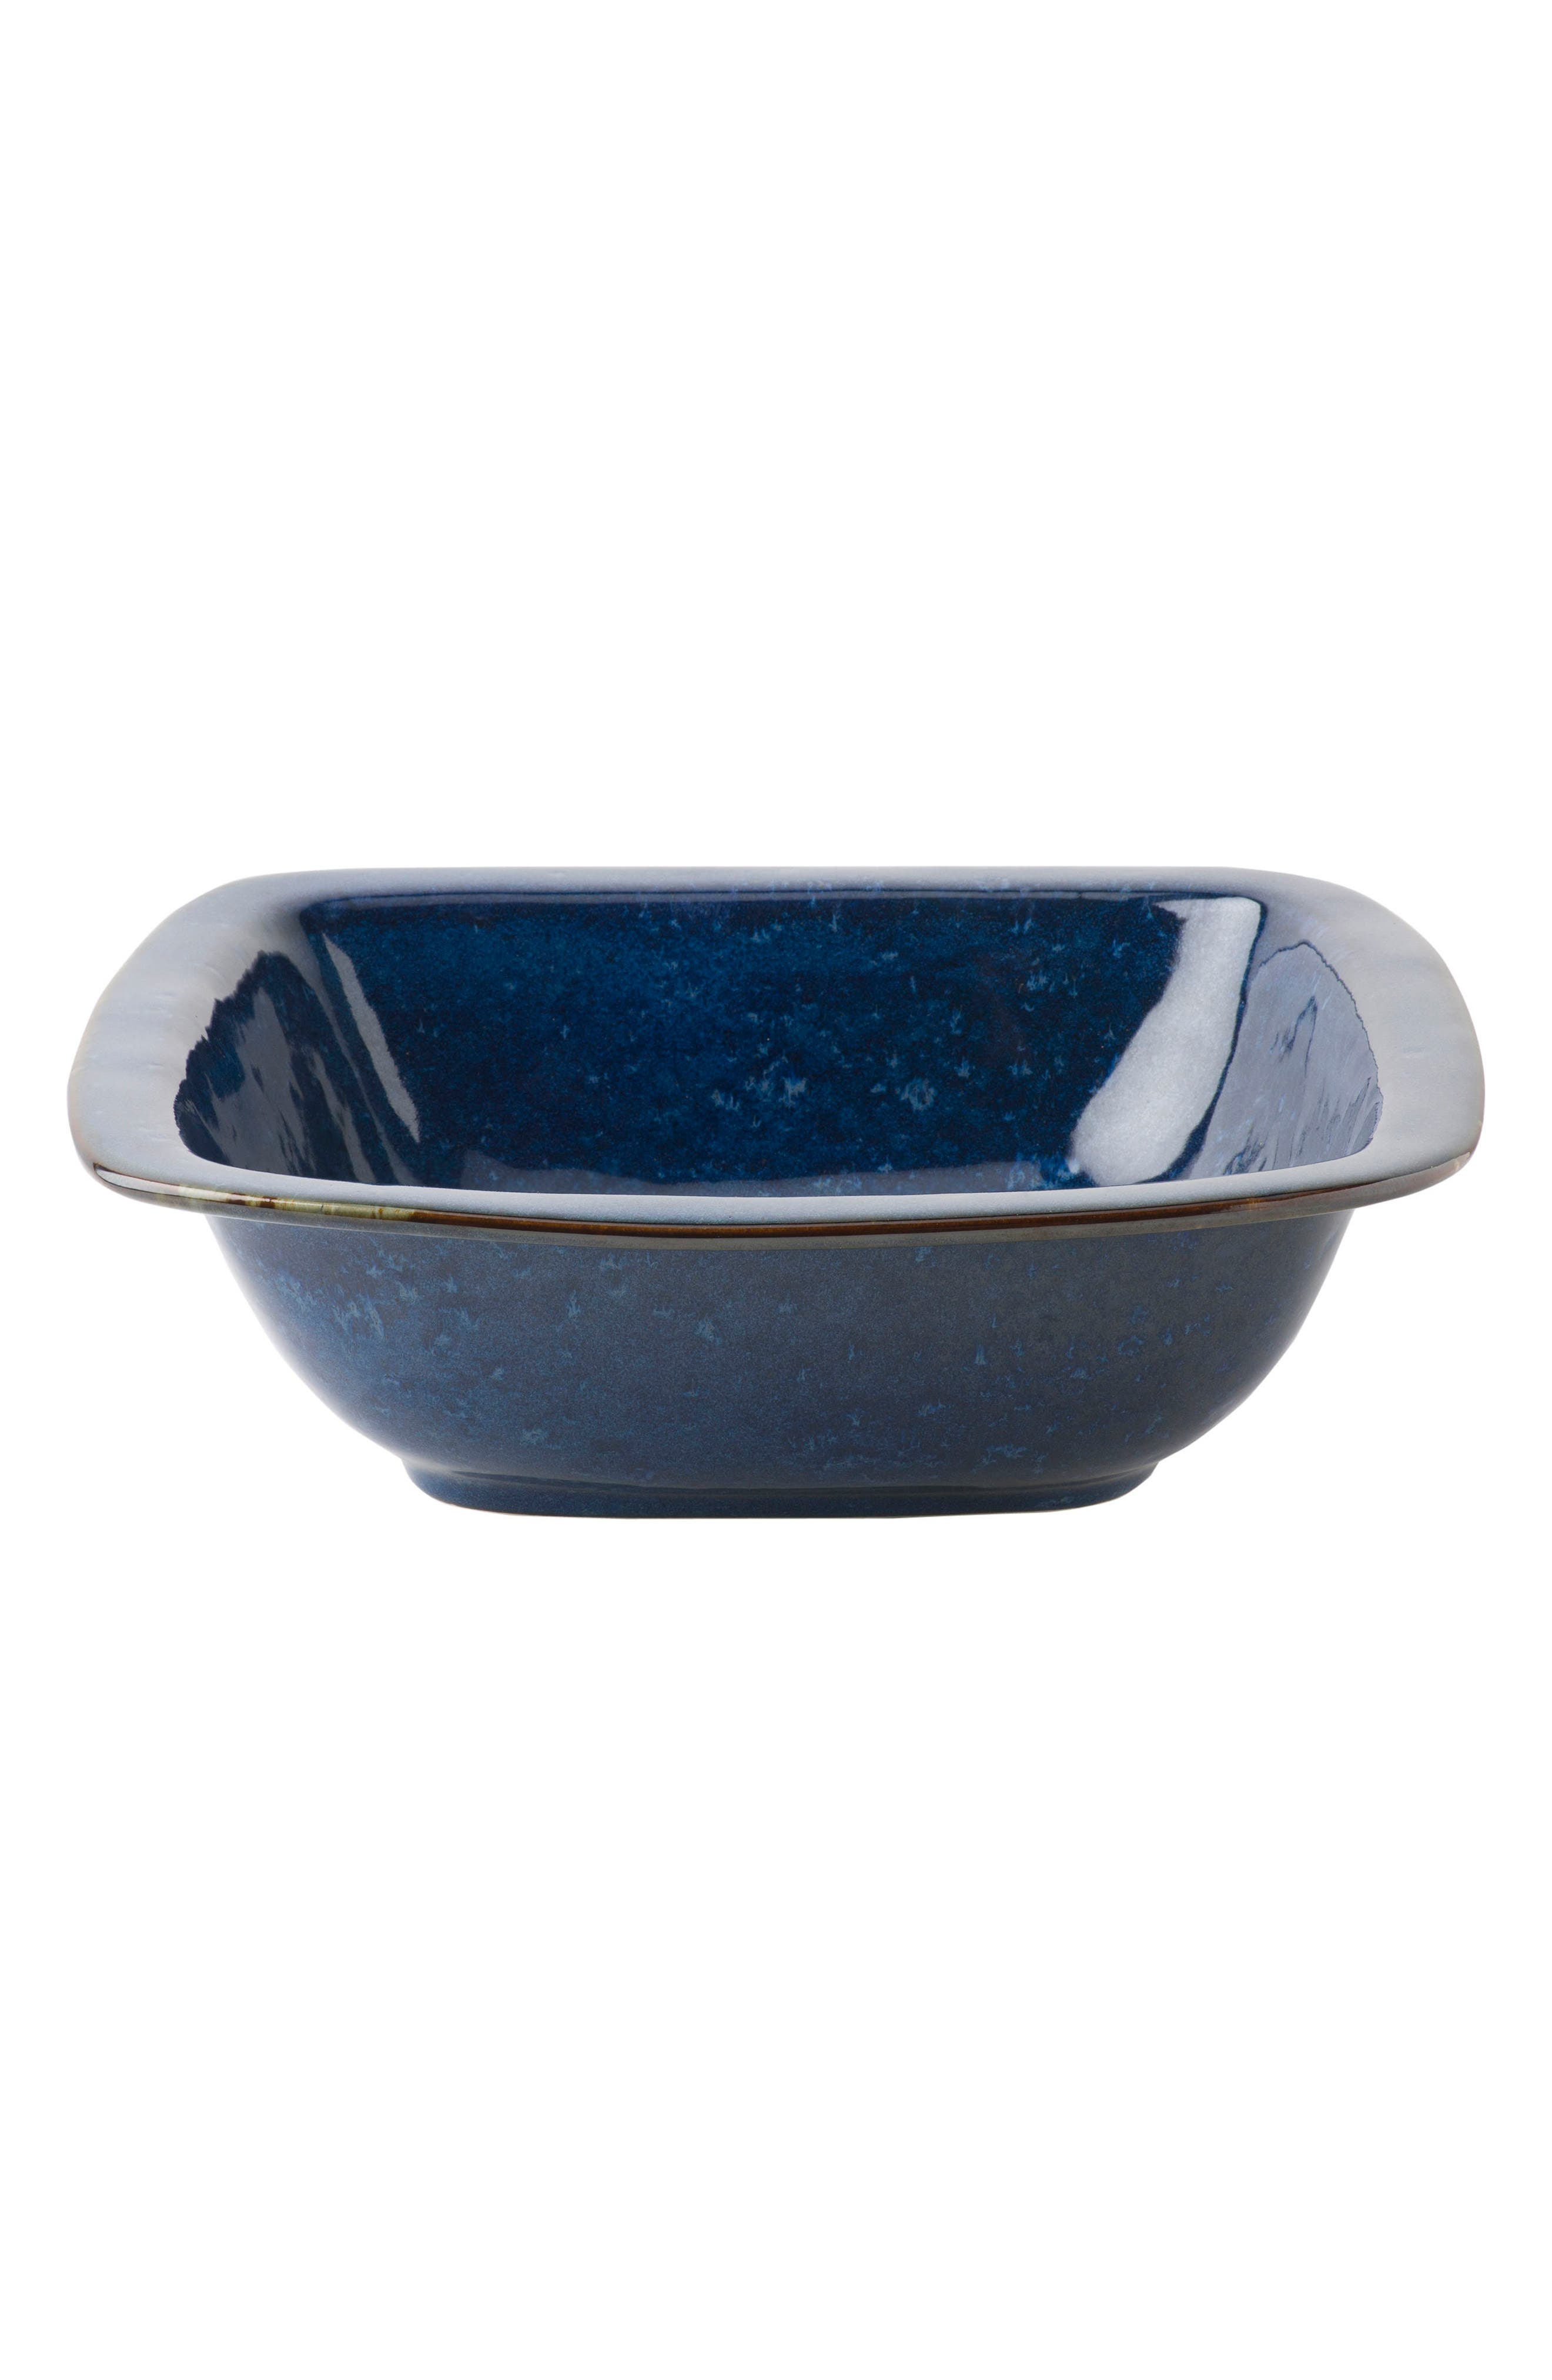 Juliska Puro Ceramic Serving Bowl